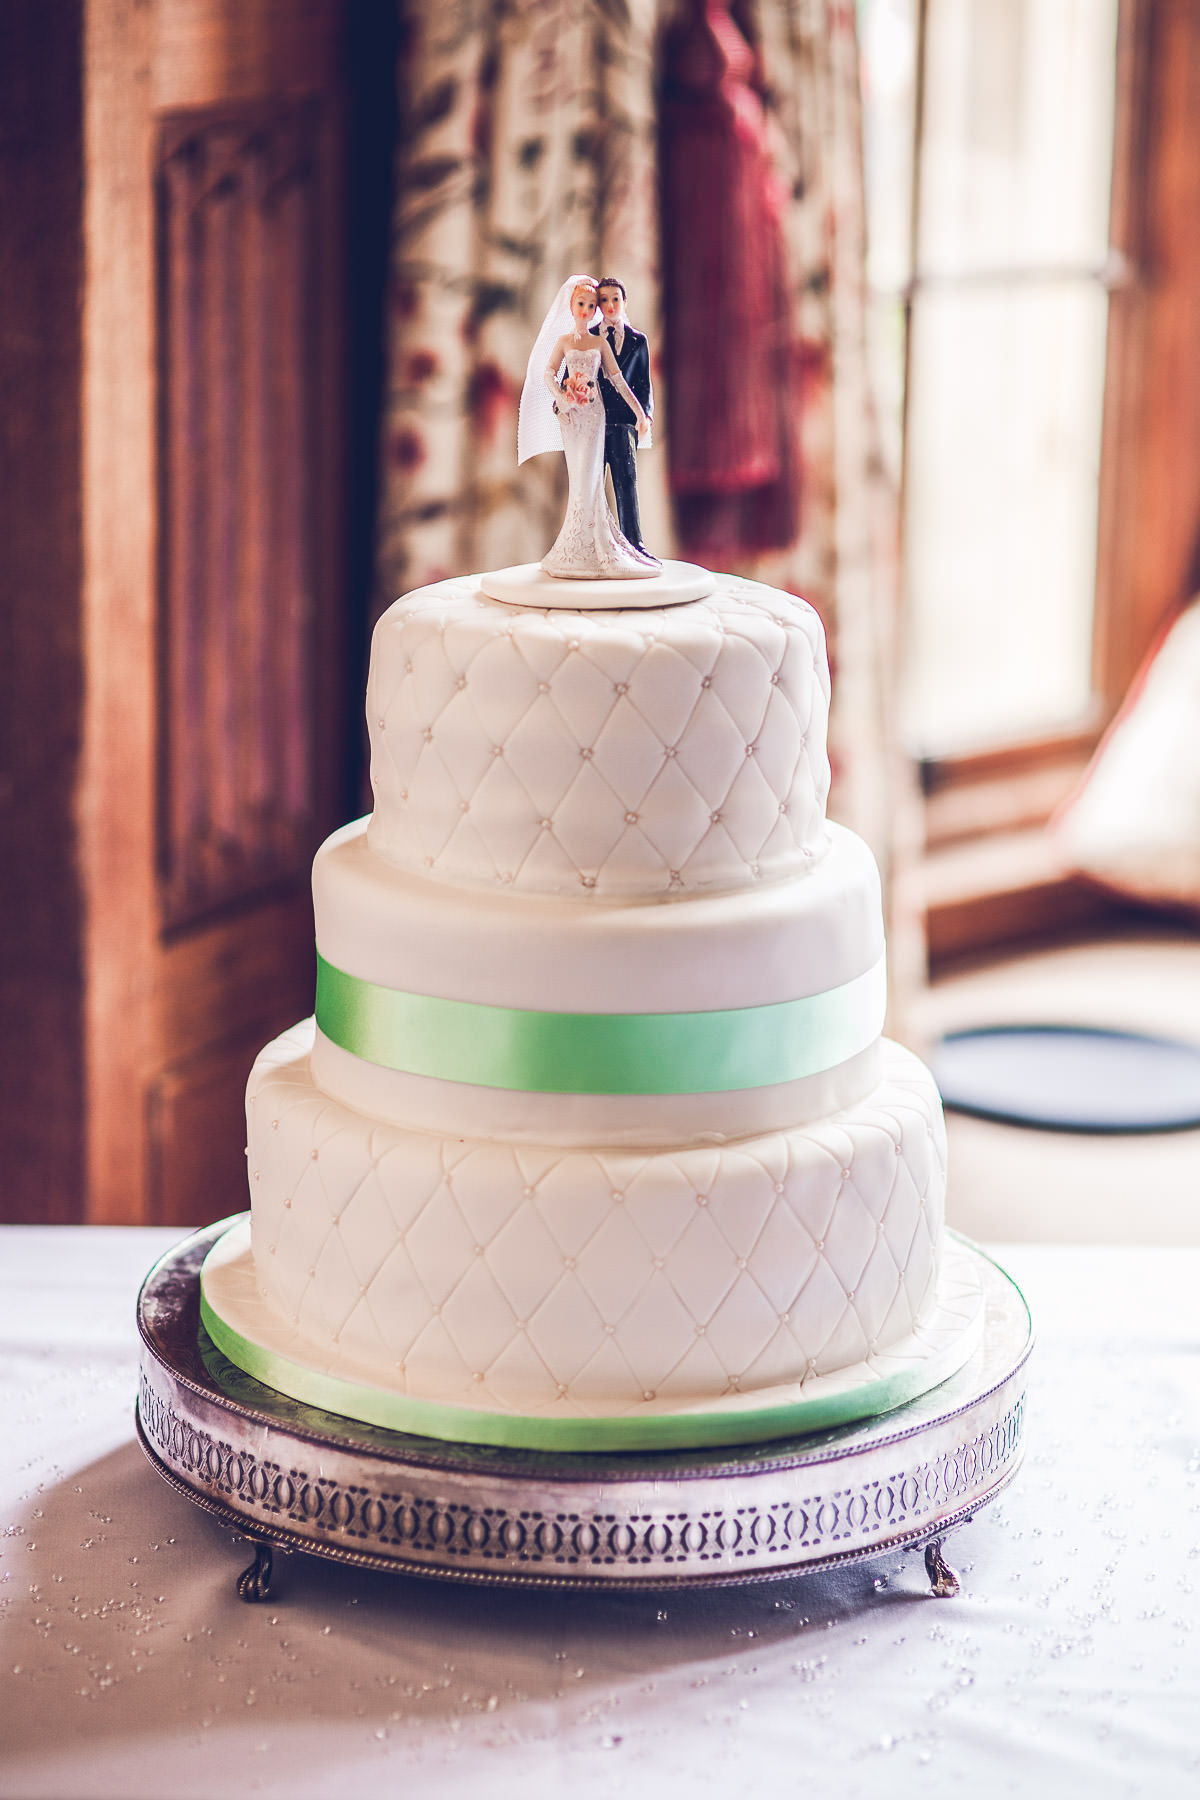 051 - Dumbleton Hall Wedding Photographer - Kate and Dave